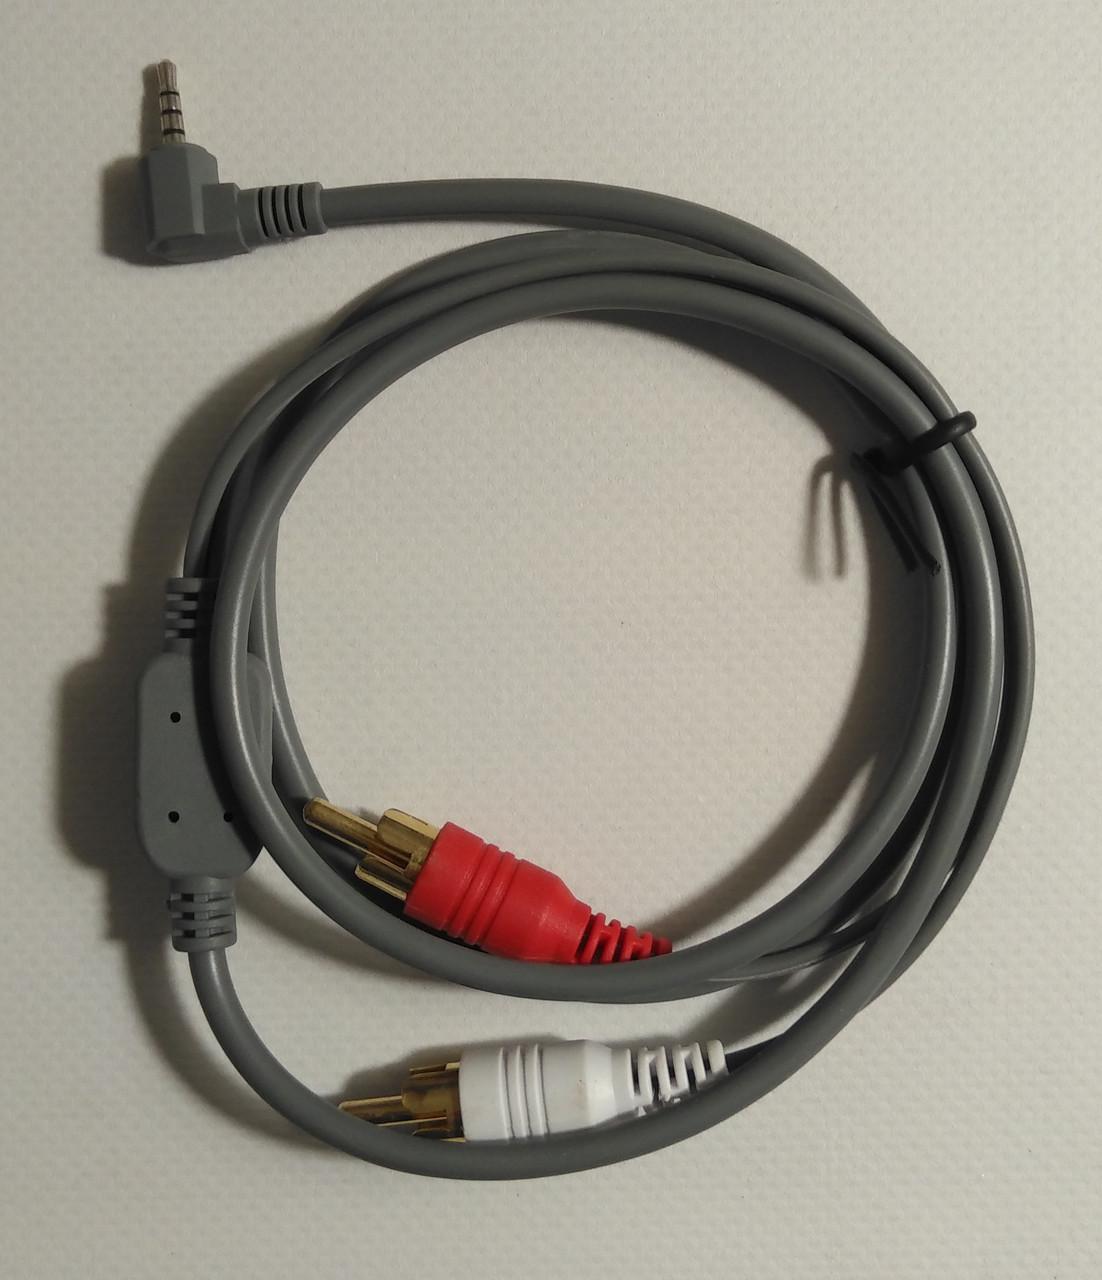 Кабель MMC-70 3,5 мм разъема (MMC-70 для Sony Ericsson K750i / D750i K510)